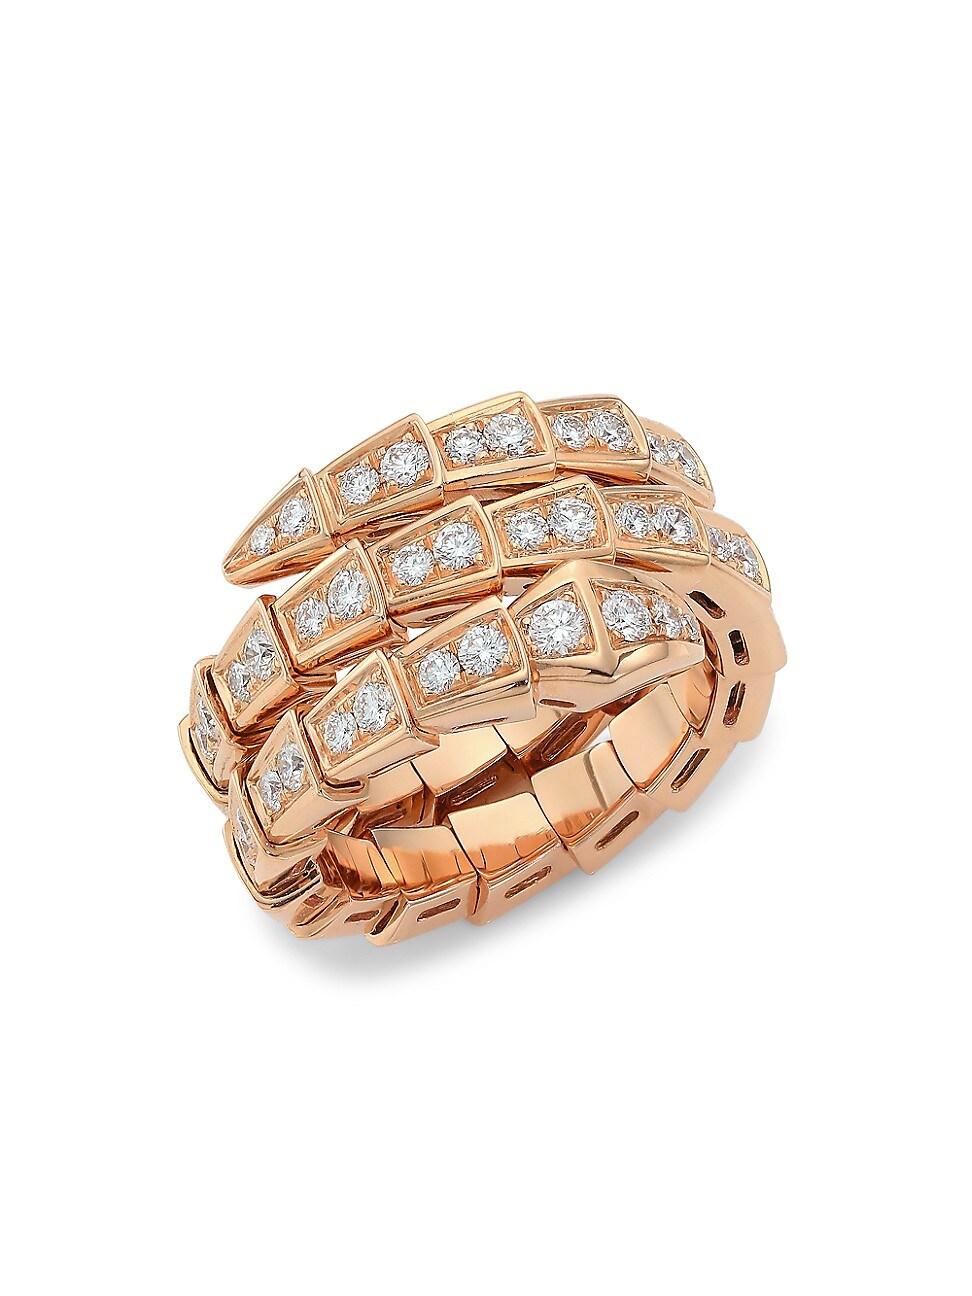 Bvlgari WOMEN'S SERPENTI VIPER 18K ROSE GOLD & PAVÉ DIAMOND 2-COIL RING